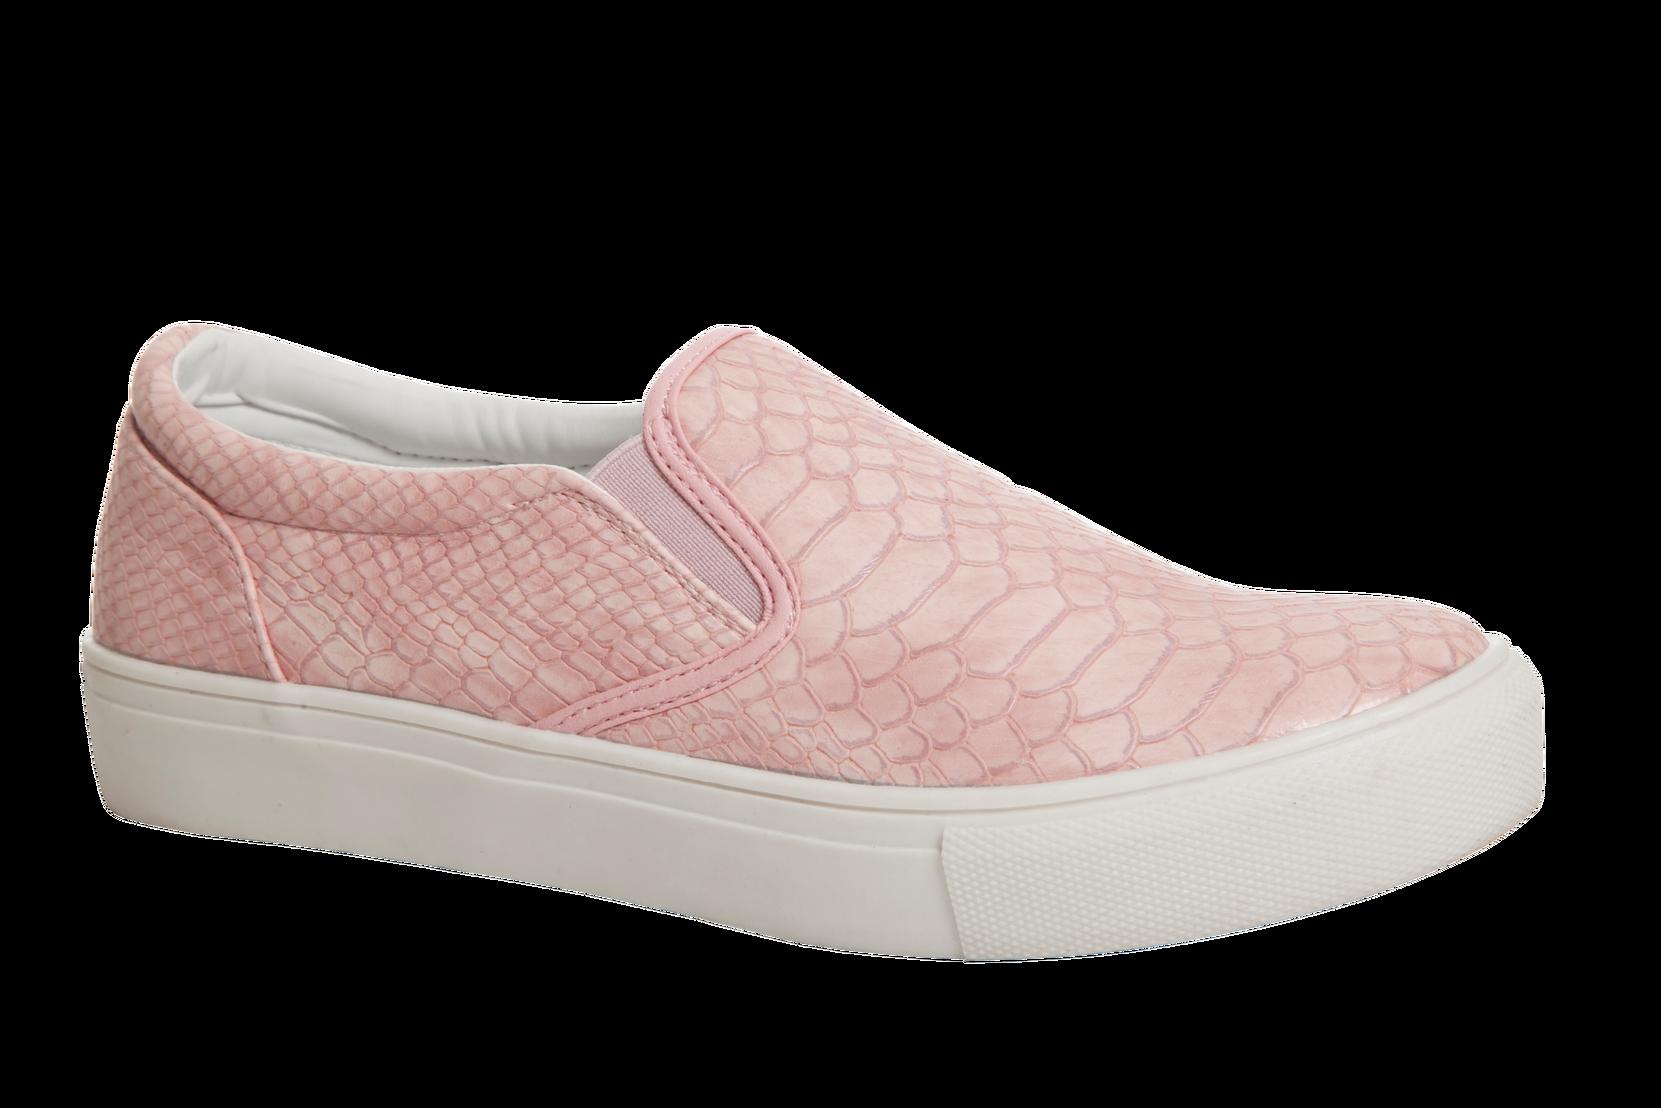 Krokotiilikuvioiset kengät